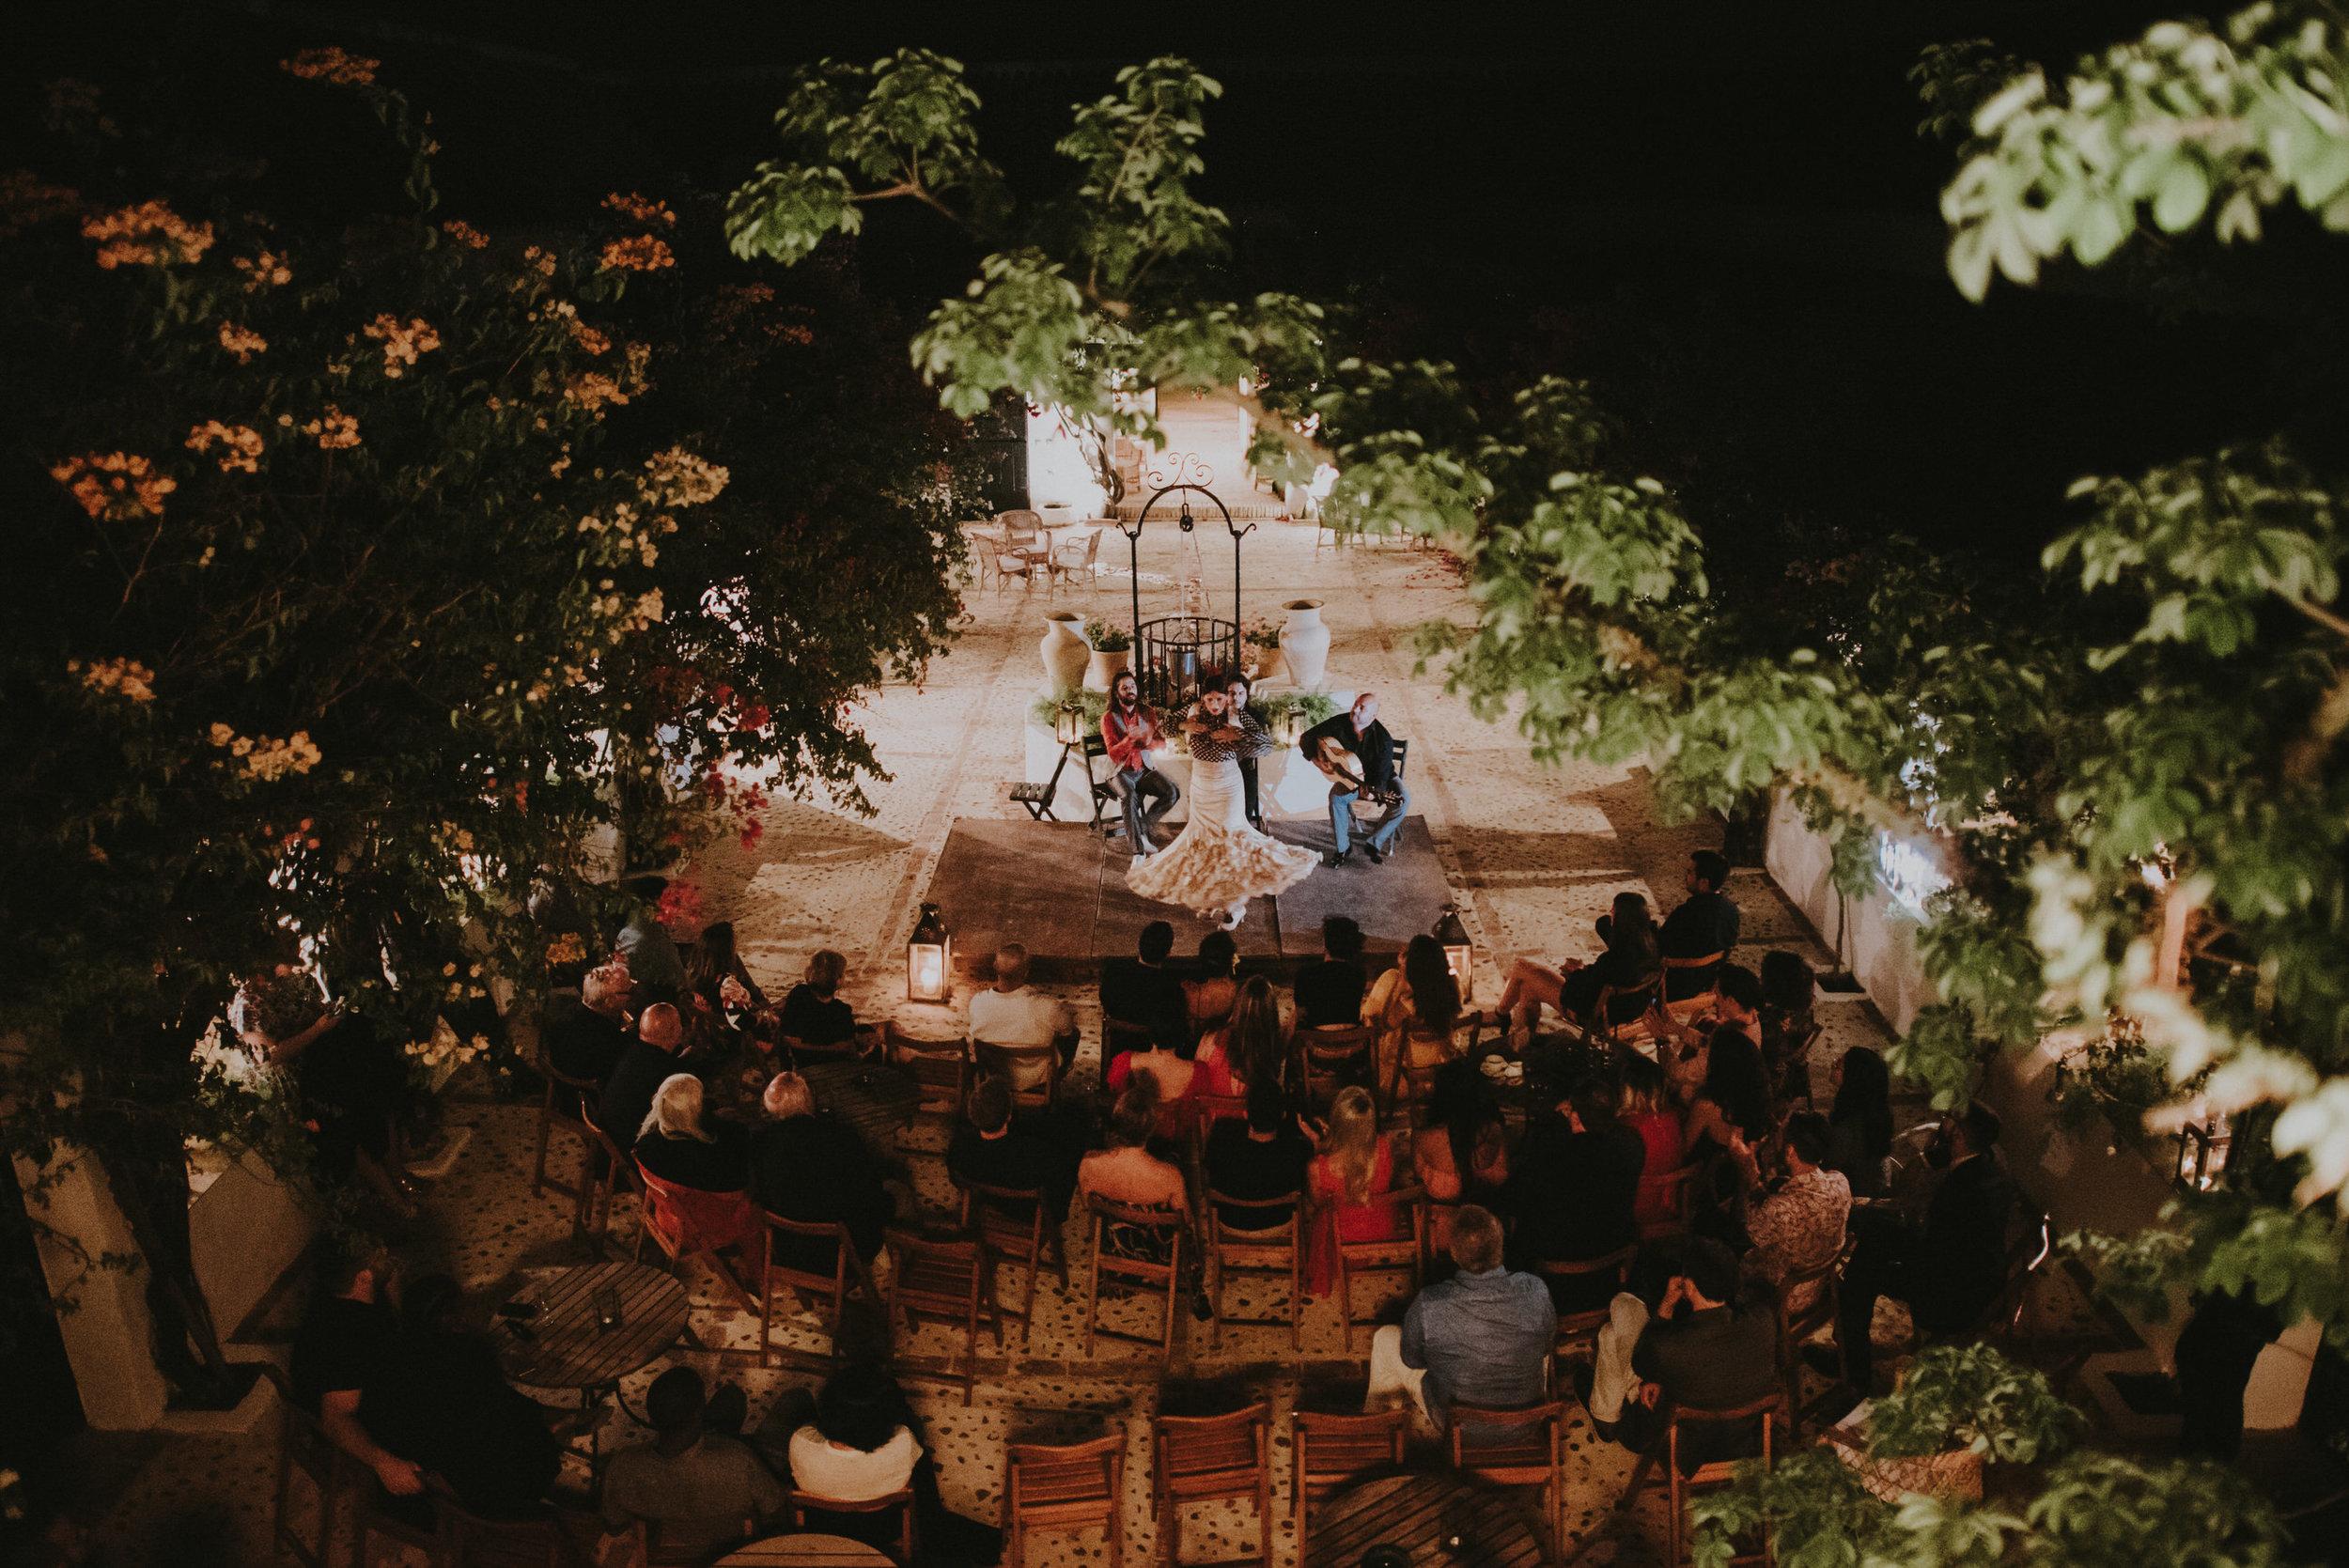 Andres+Amarillo+fotografo+boda+sevilla+natural+sin+poses+hacienda+san+rafael (17).JPG